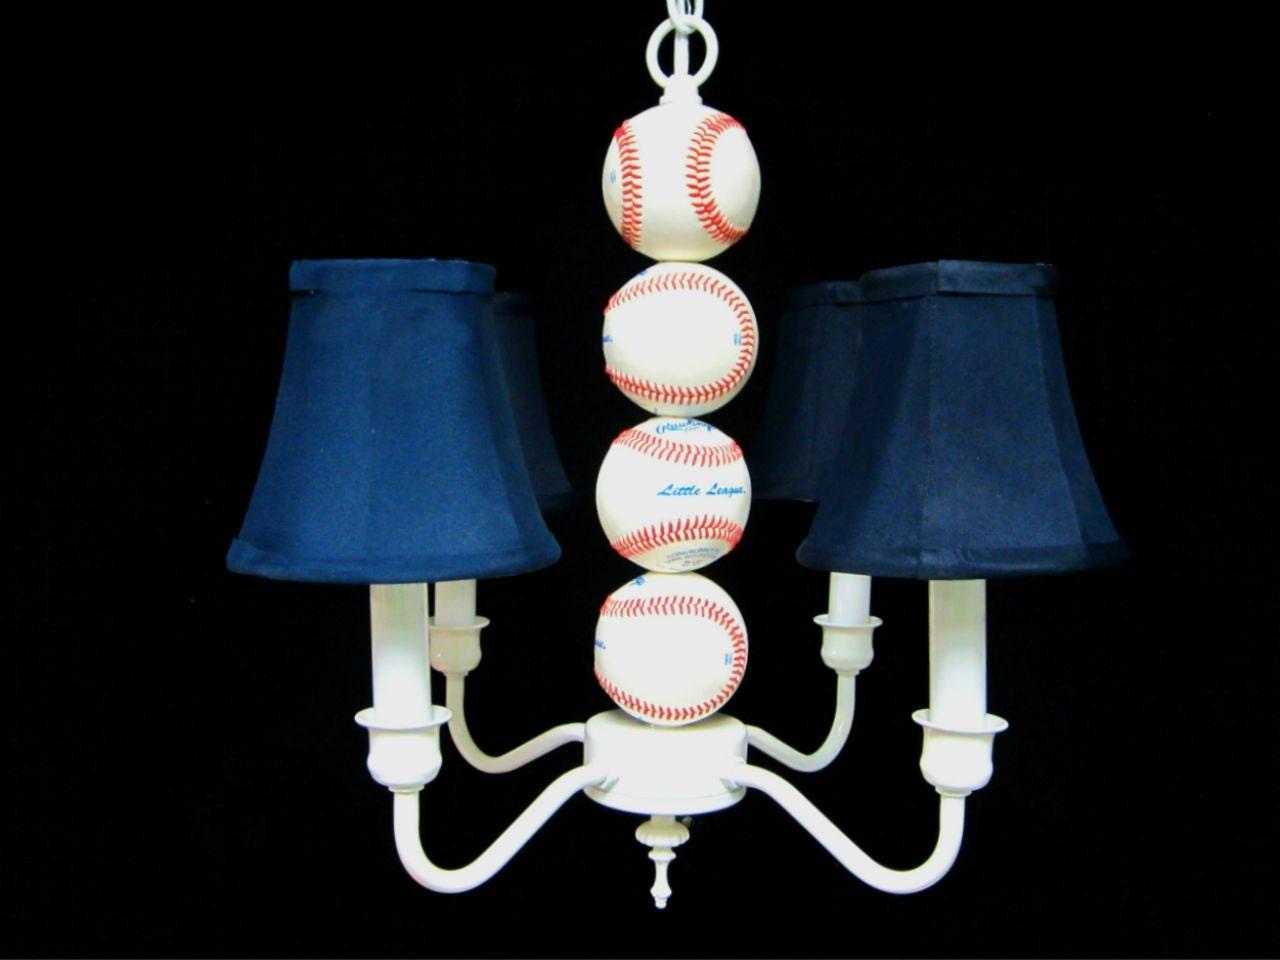 Sports chandelier lighting baseball decor sports decor zoom arubaitofo Image collections